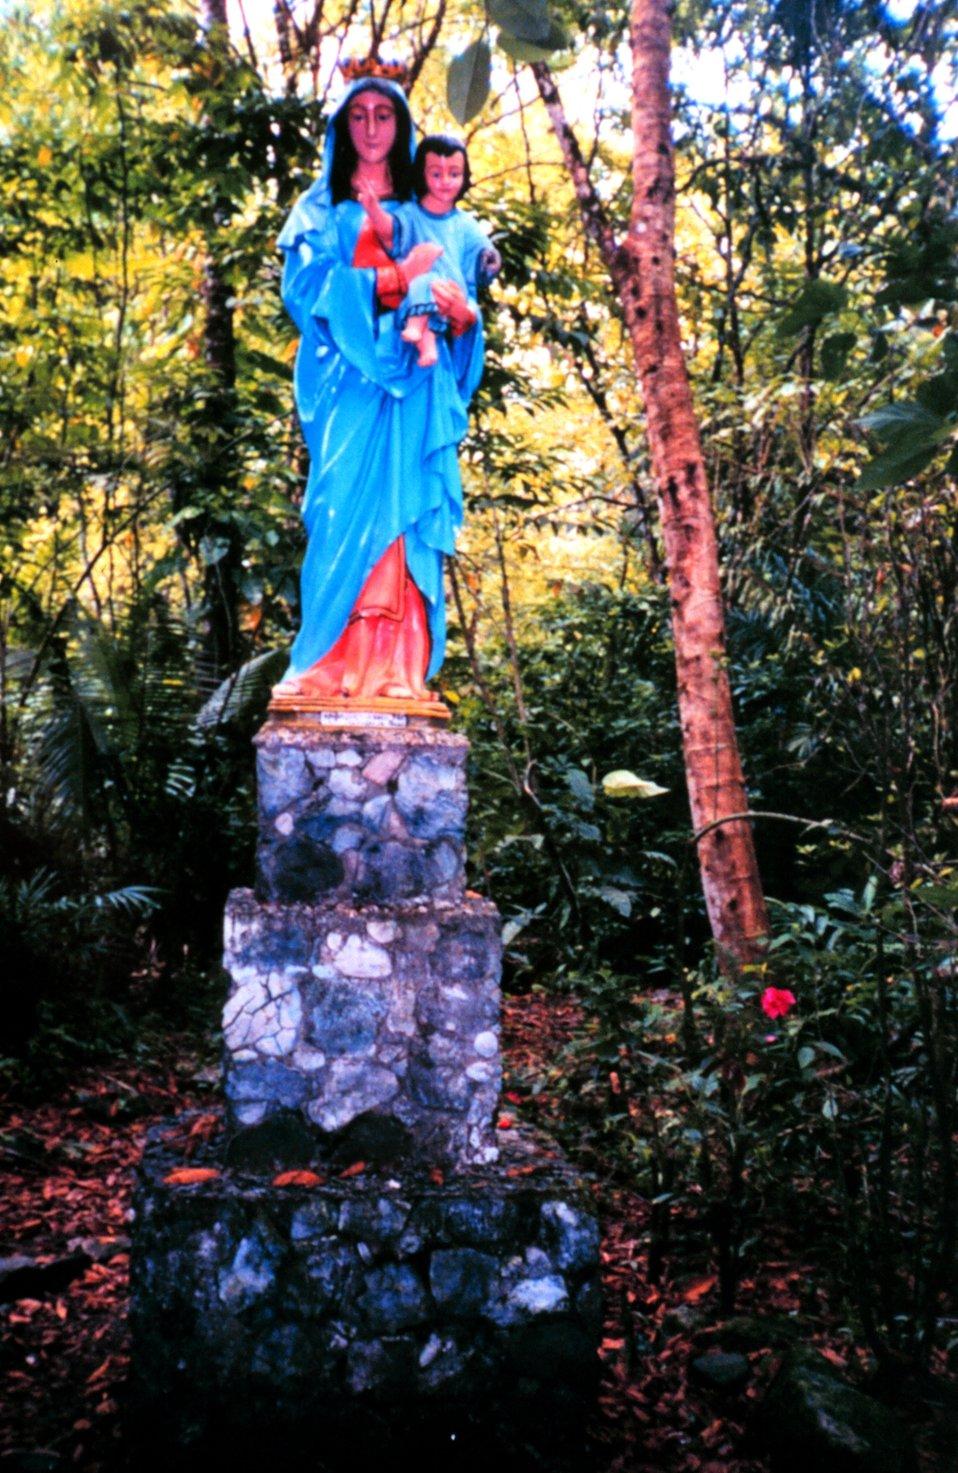 A statue of the Virgin Mary on Isla Gorgona.